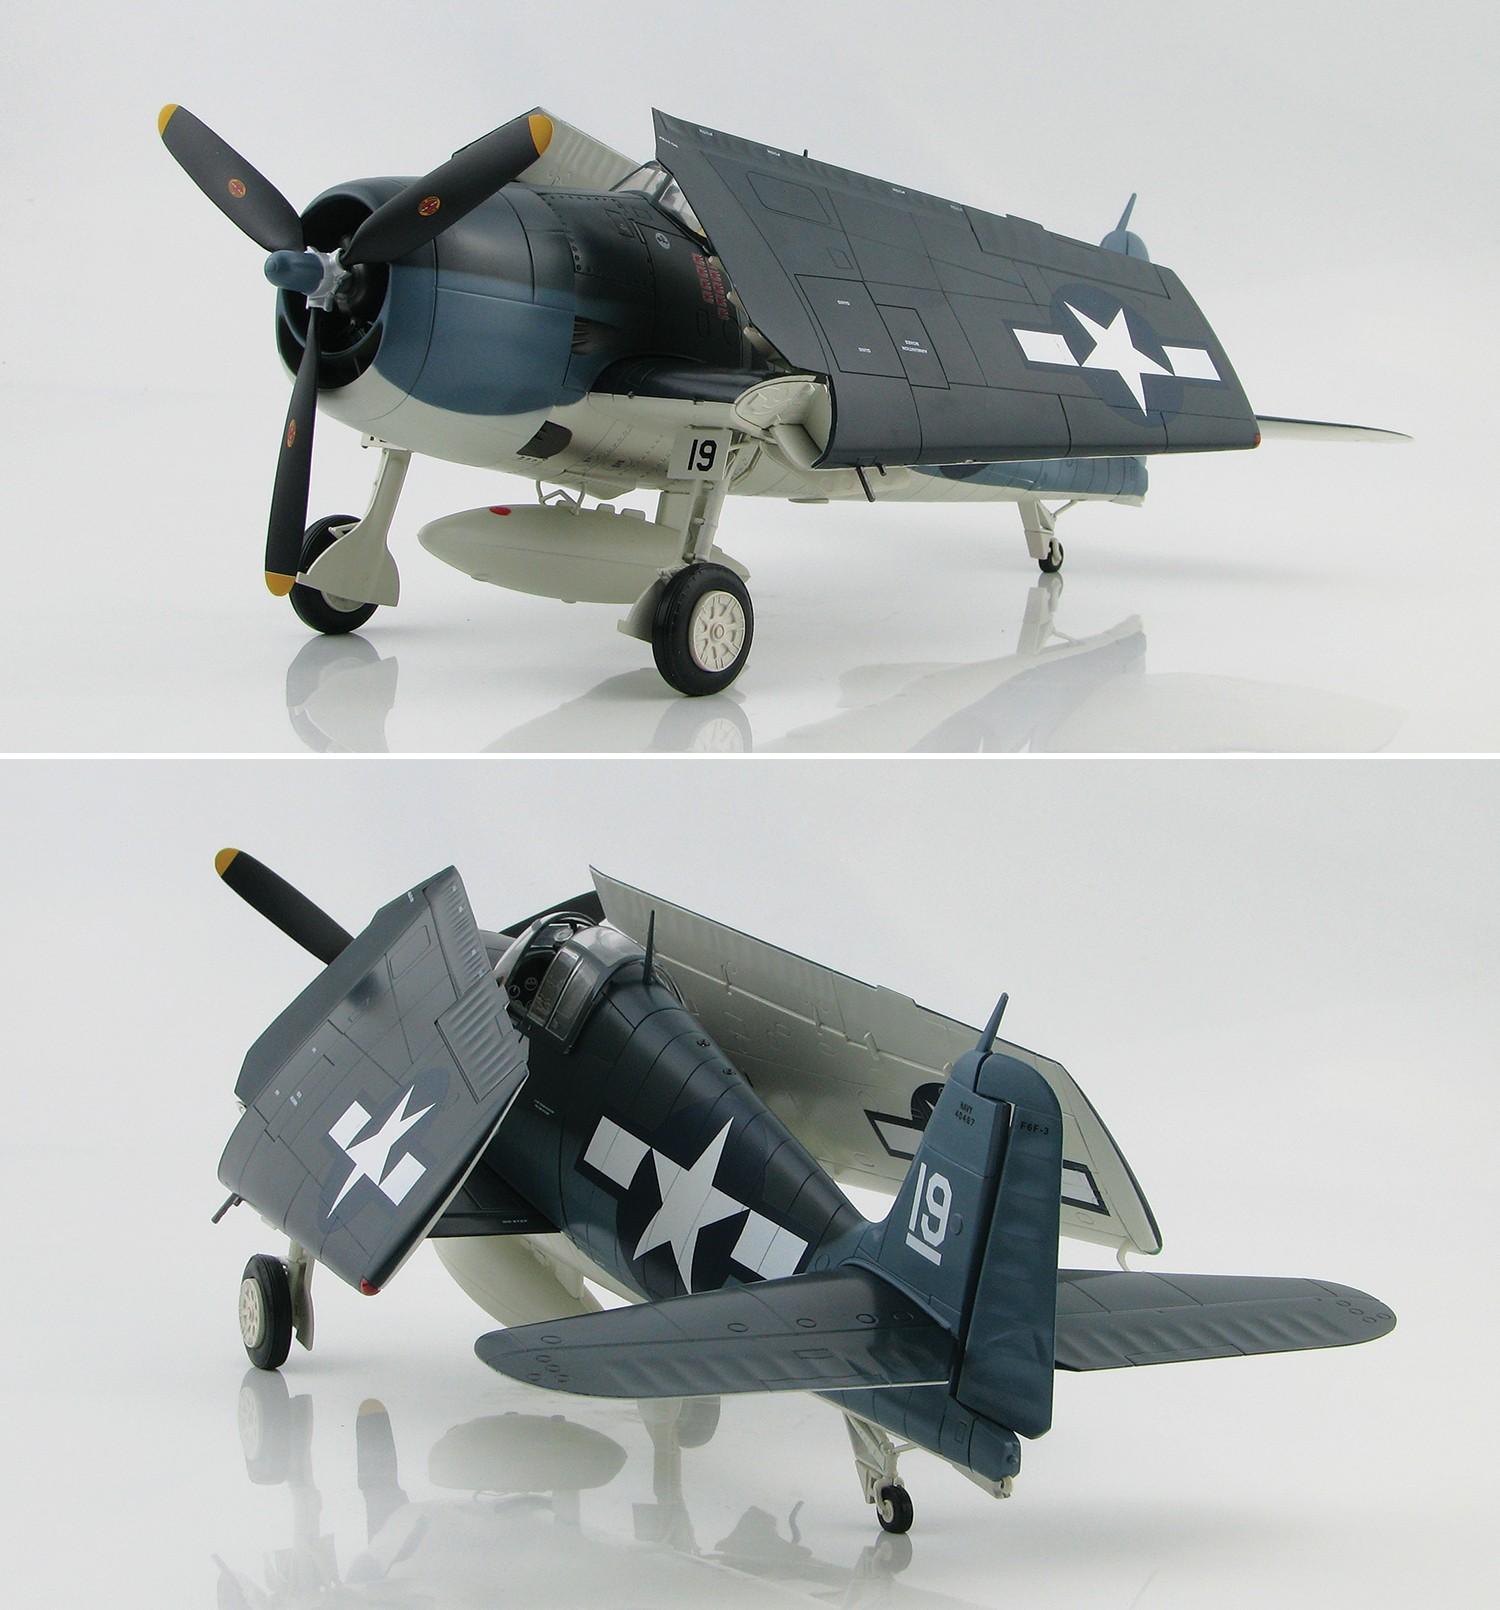 Highly detailed Hobby Master F6F Hellcat Grumman F6F-3 ...